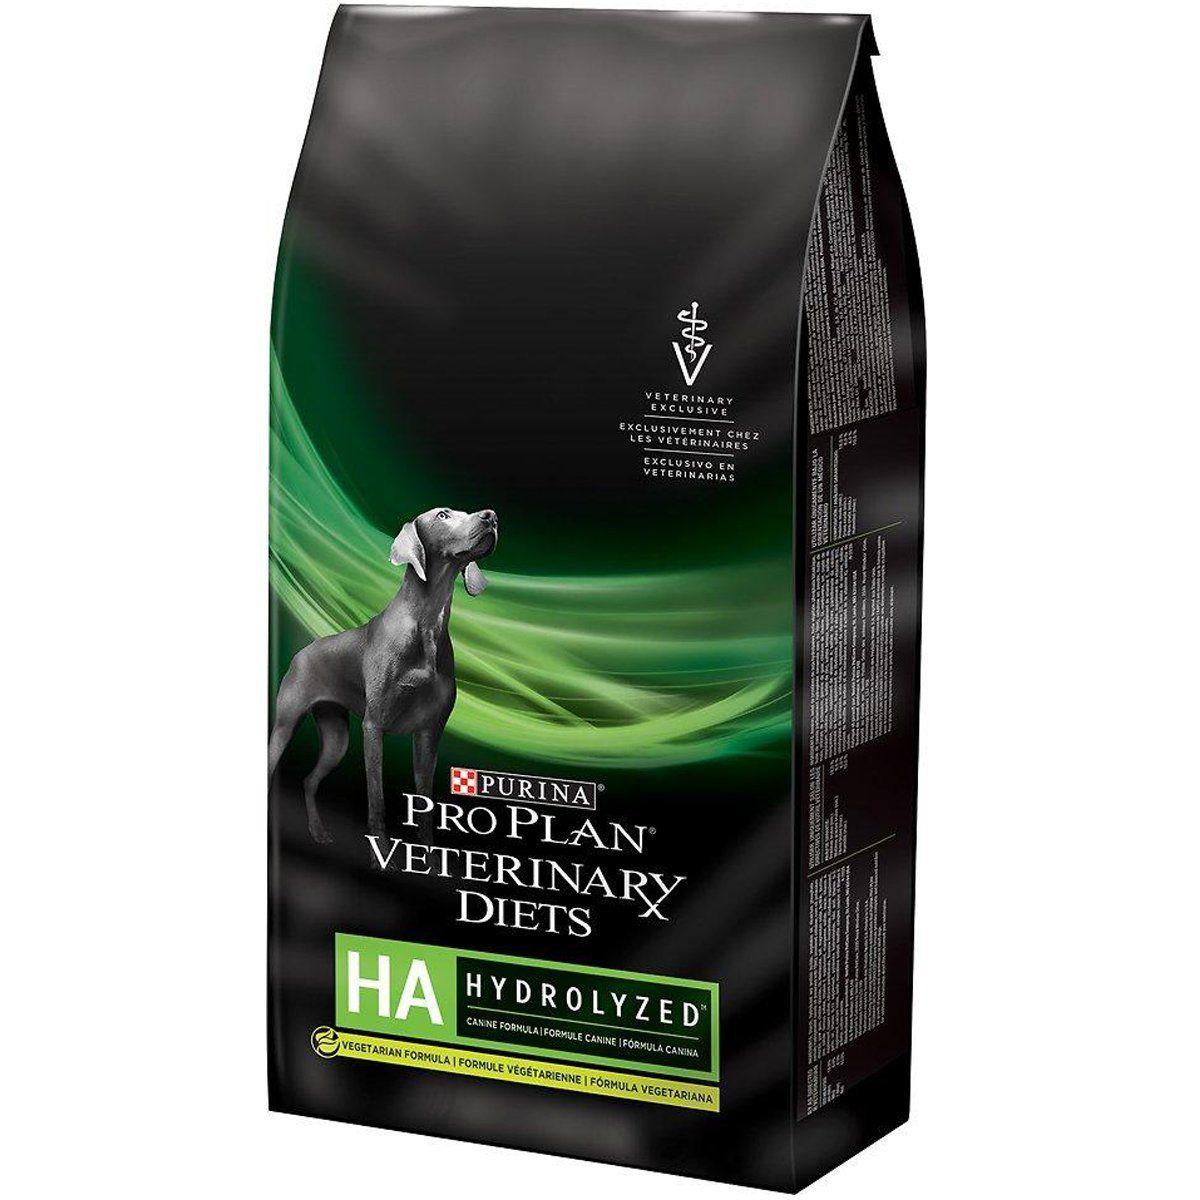 Purina HA Hydrolyzed Dog Food 25 lb ** Read more reviews